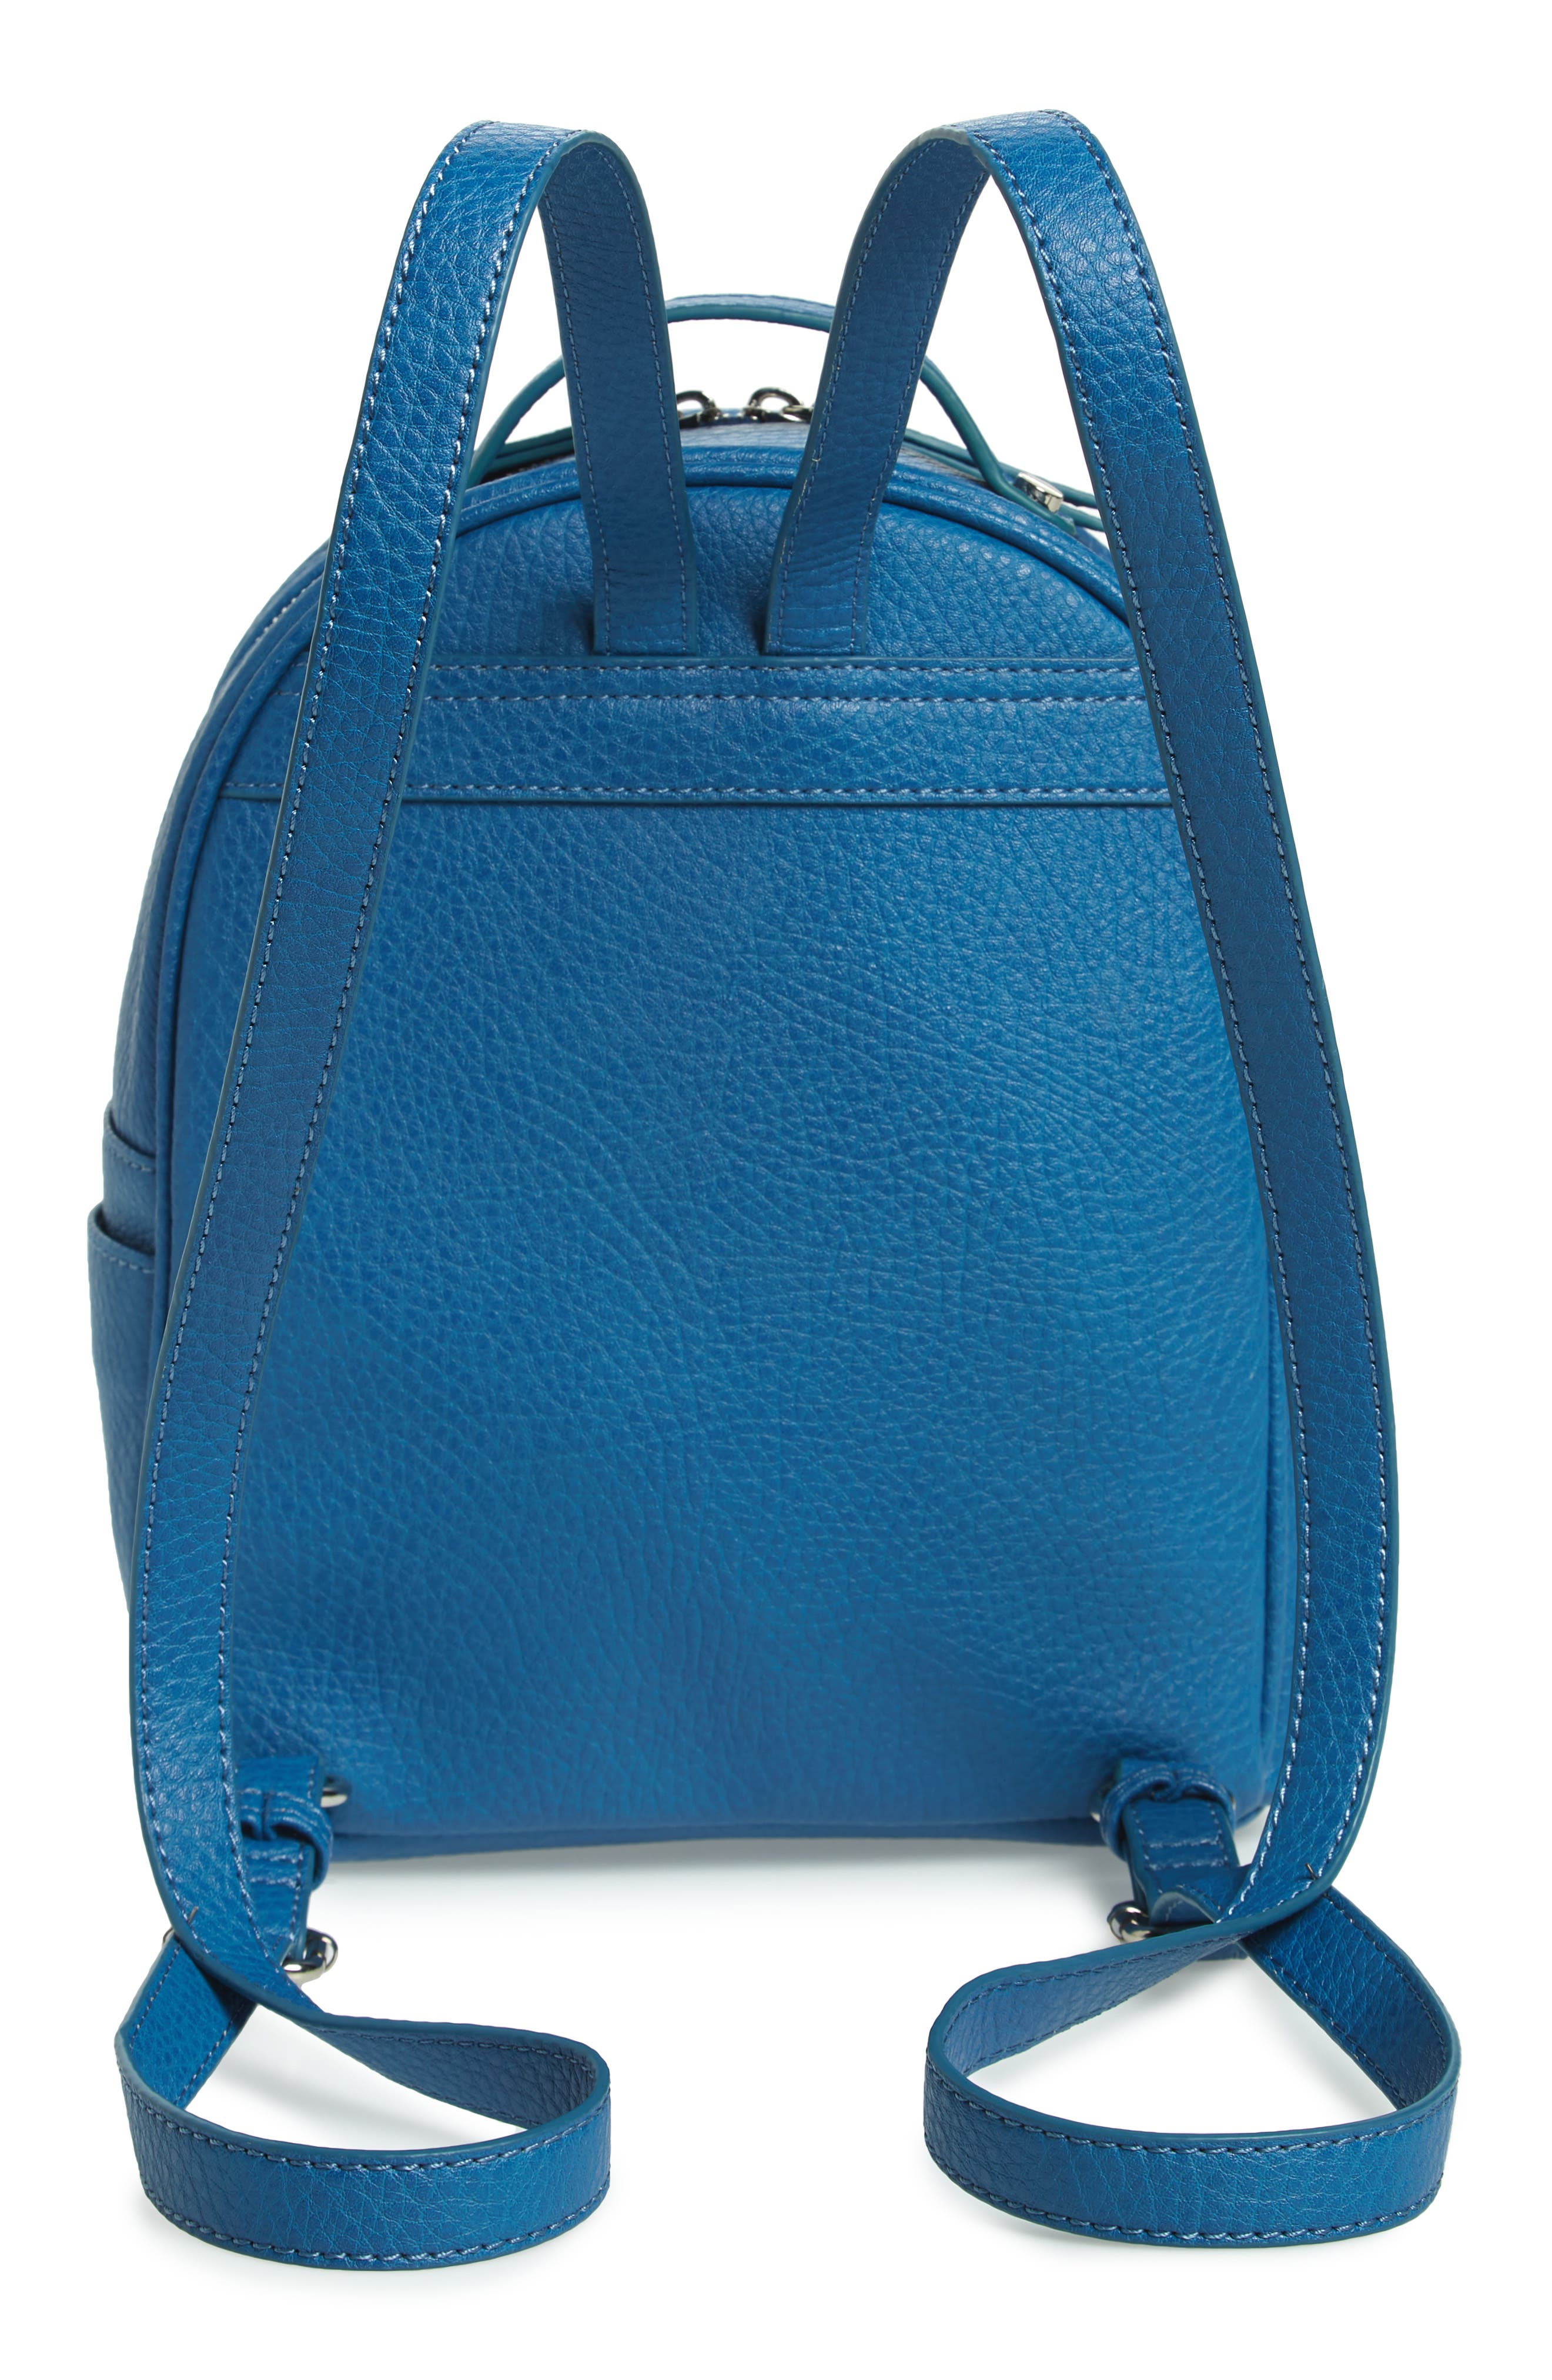 Mali + Lili Hannah Vegan Leather Backpack,                             Alternate thumbnail 3, color,                             FRENCH BLUE